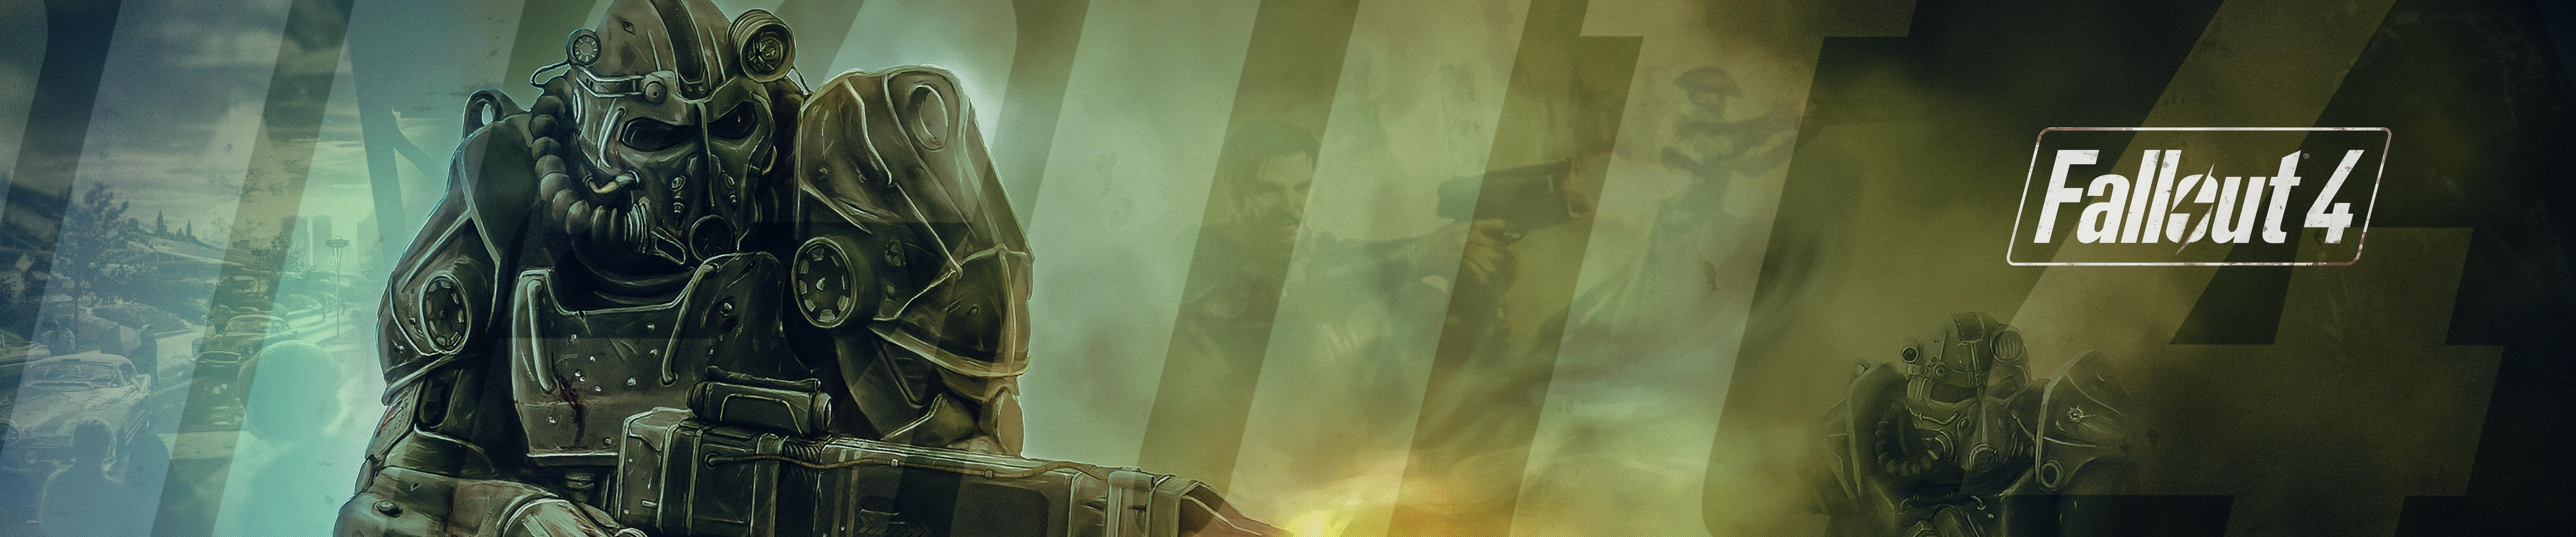 fallout 4 concept art wallpaper (triple monitor) - imgur